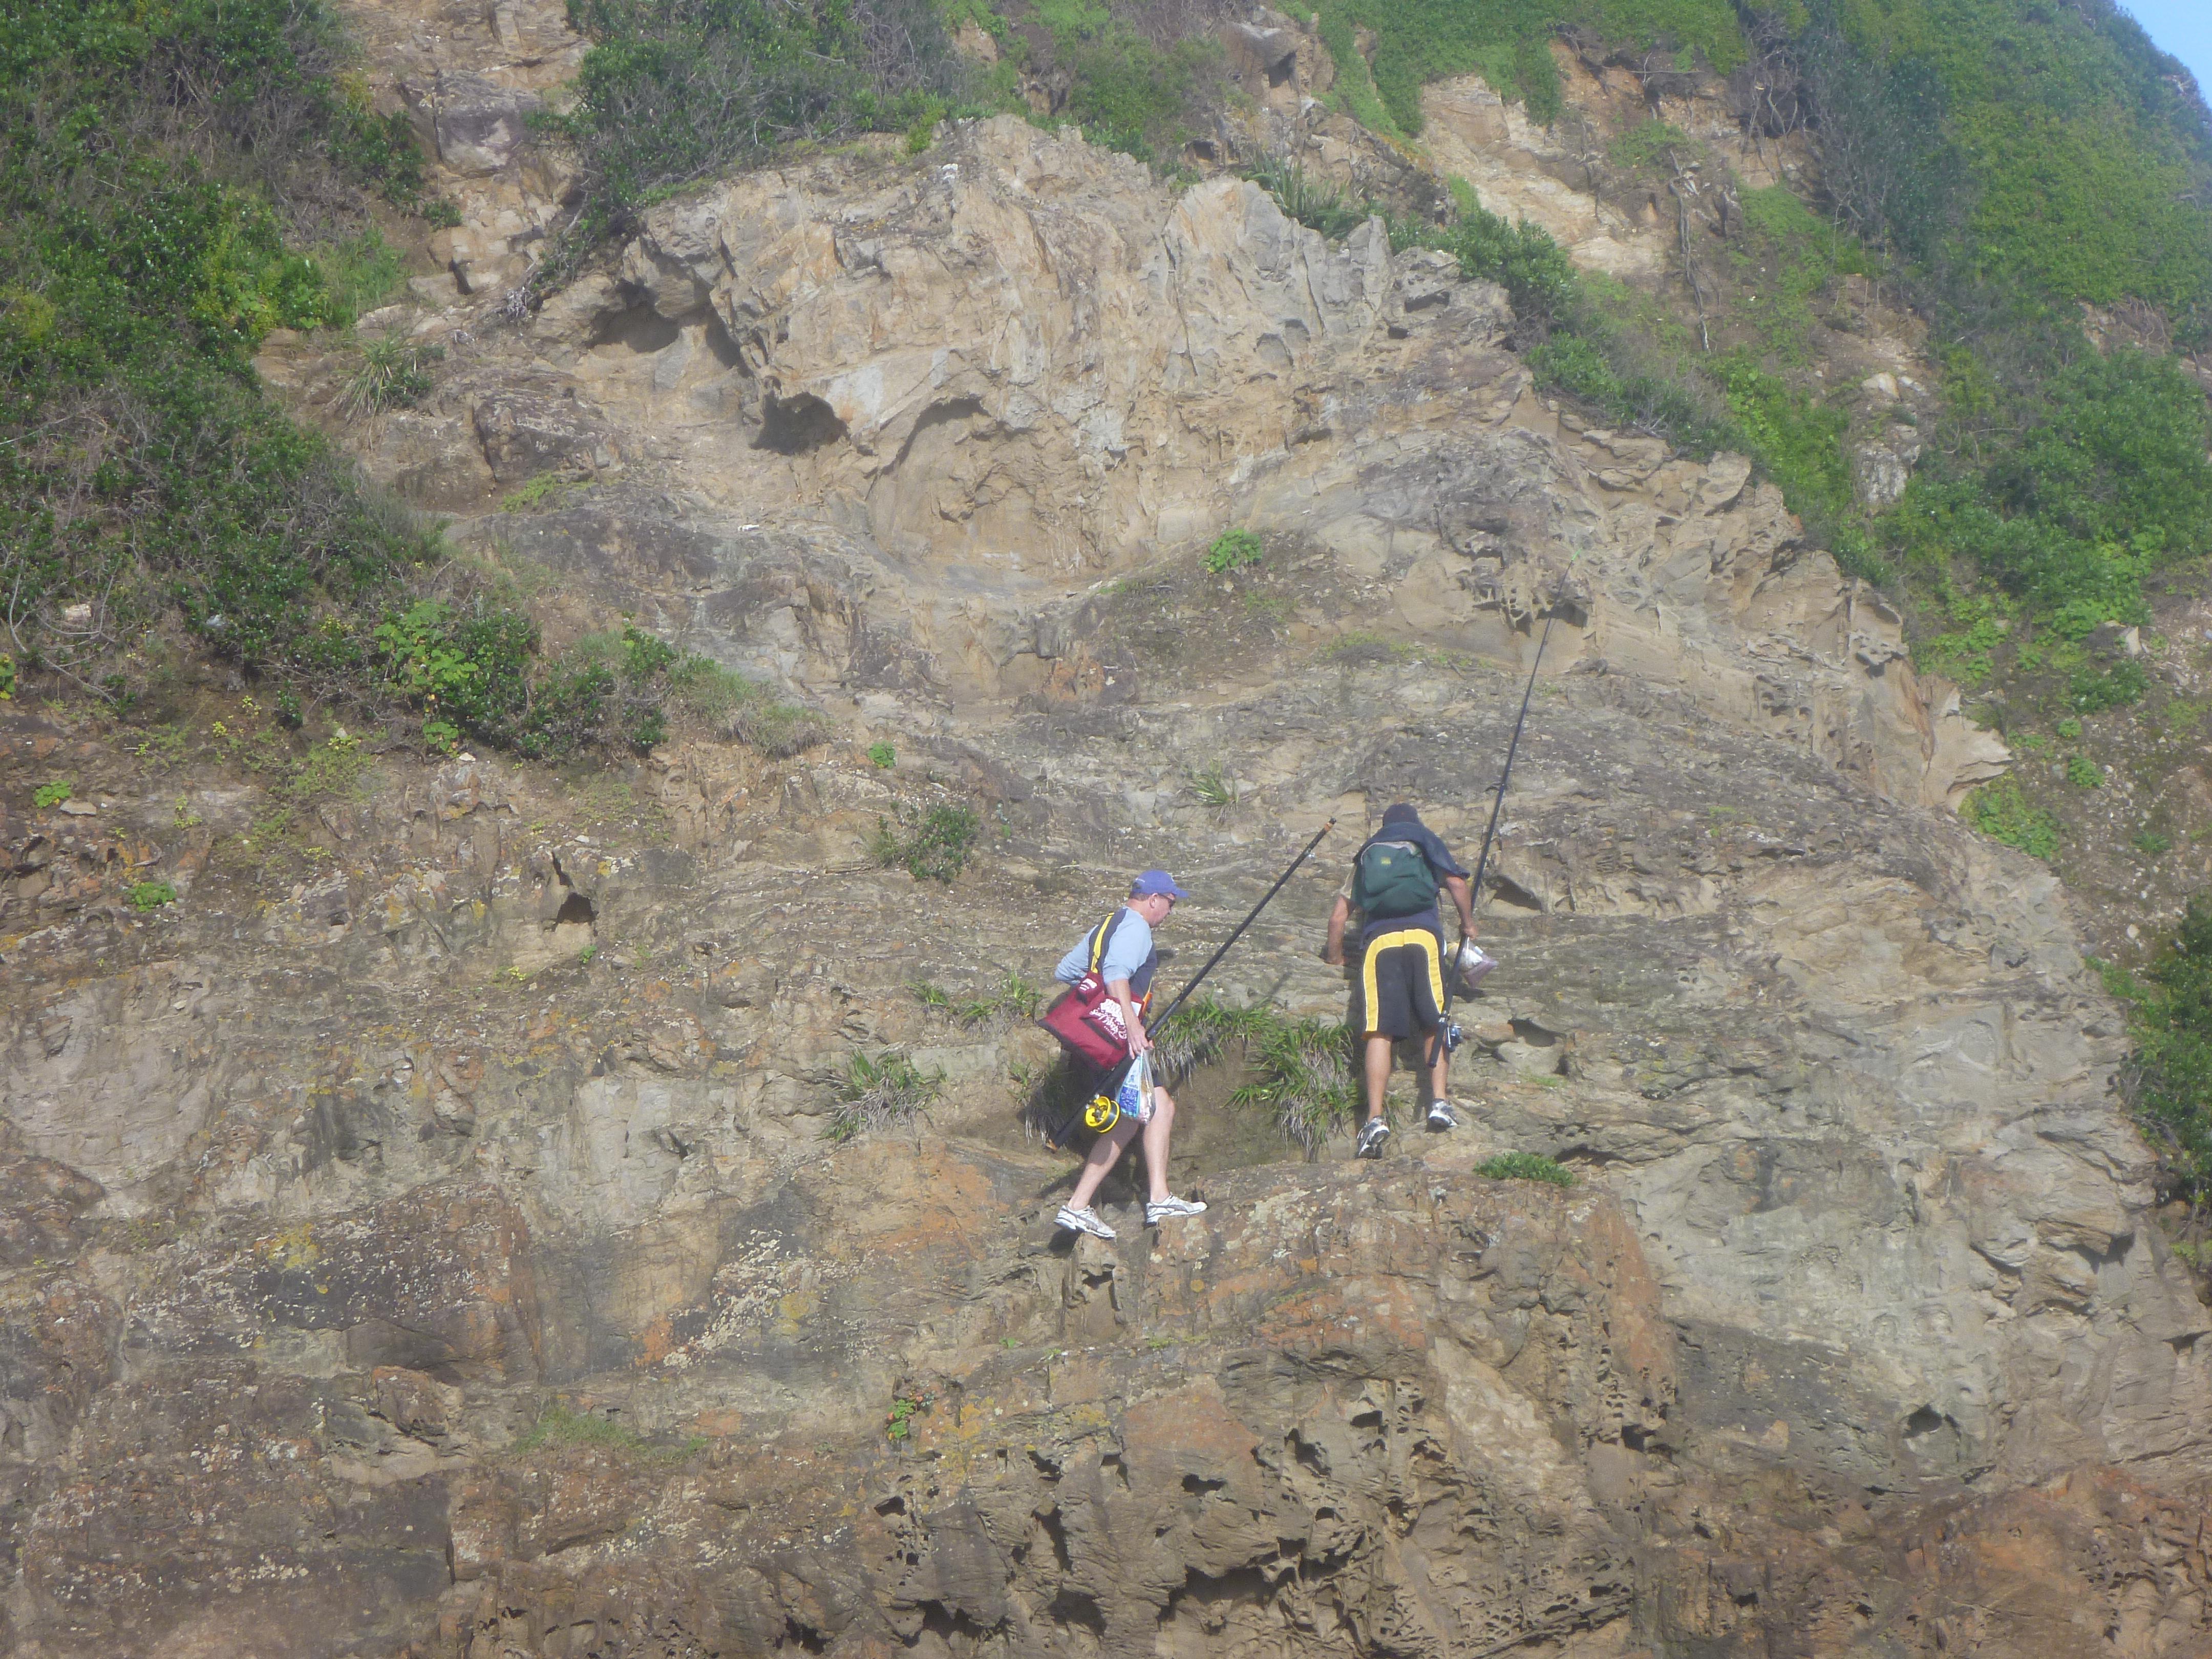 Great rock fishing spots can be mountain goat territory.